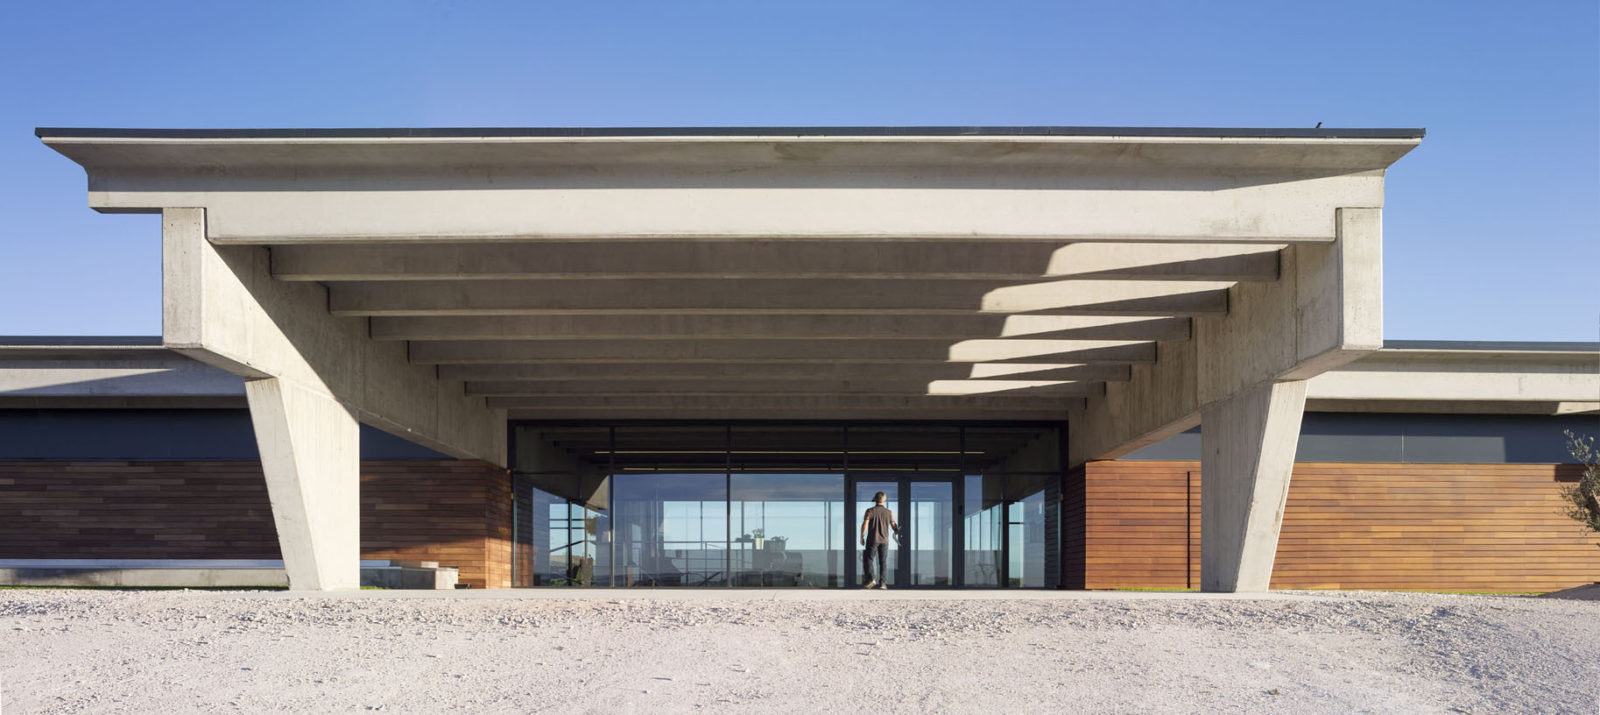 Beronia_Winery_07_Architecture_IDOM_copyright_Aitor_Ortiz